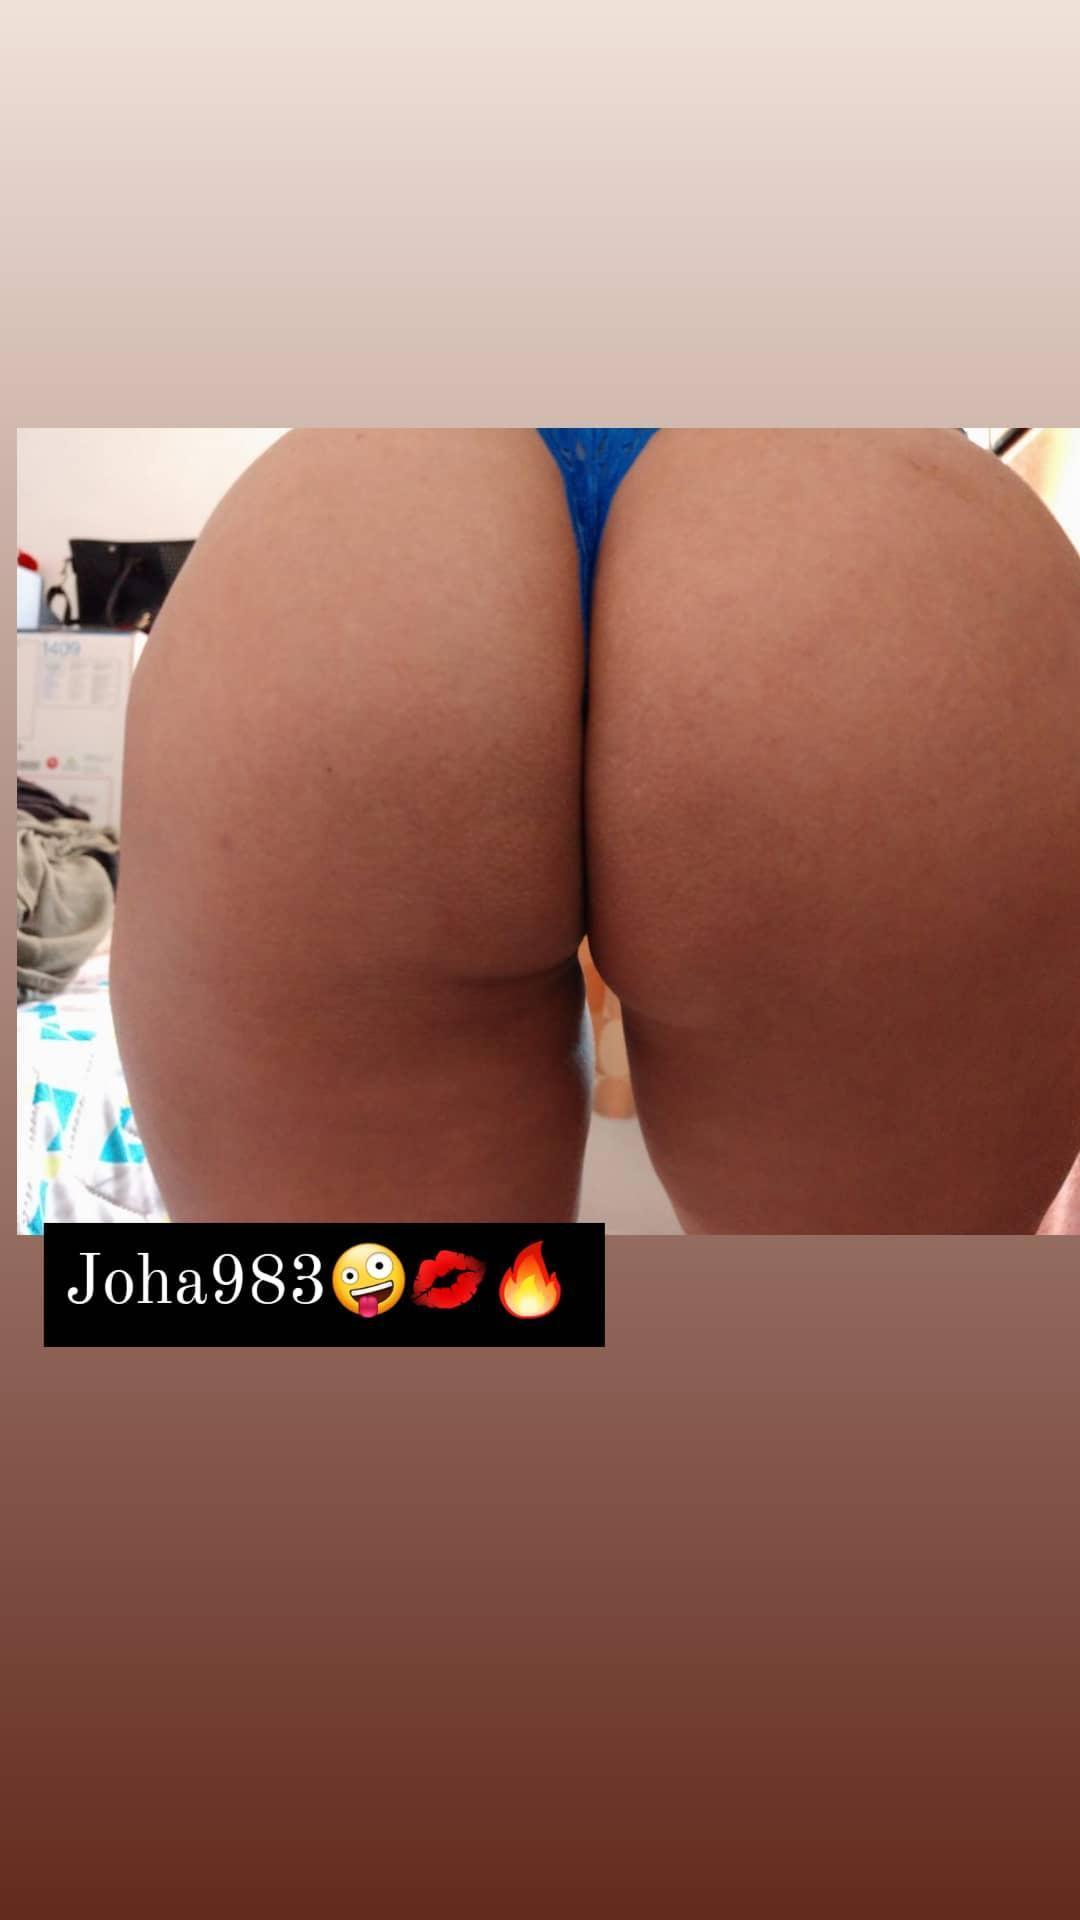 Joha983?s=knf7ld+cyj+yabydpcalglgicyesm2fbh8qwehc4io8=